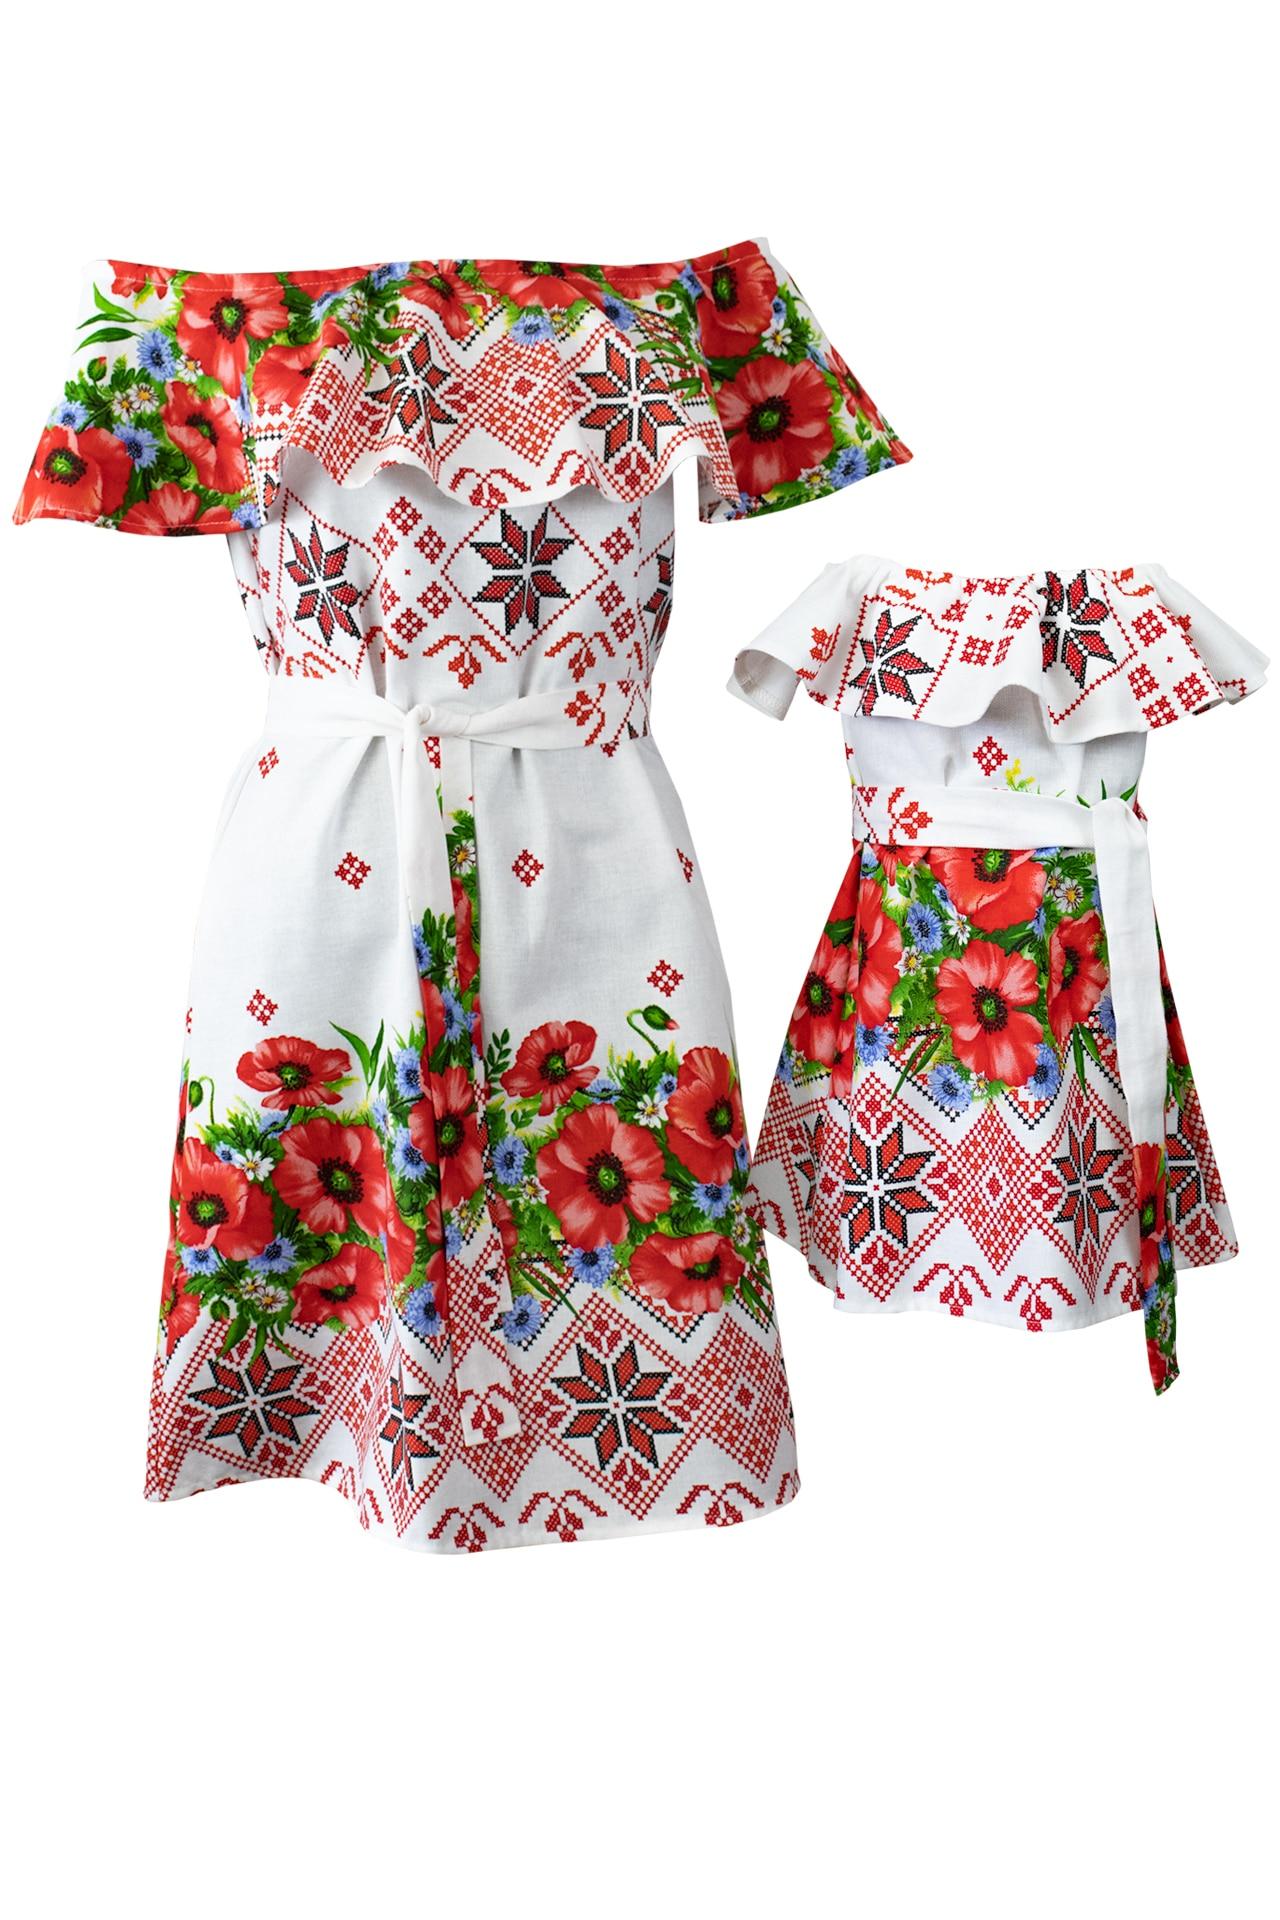 Set mama/ fiica rochii albe cu imprimeu traditional floral, marimea S + 1/2 ani